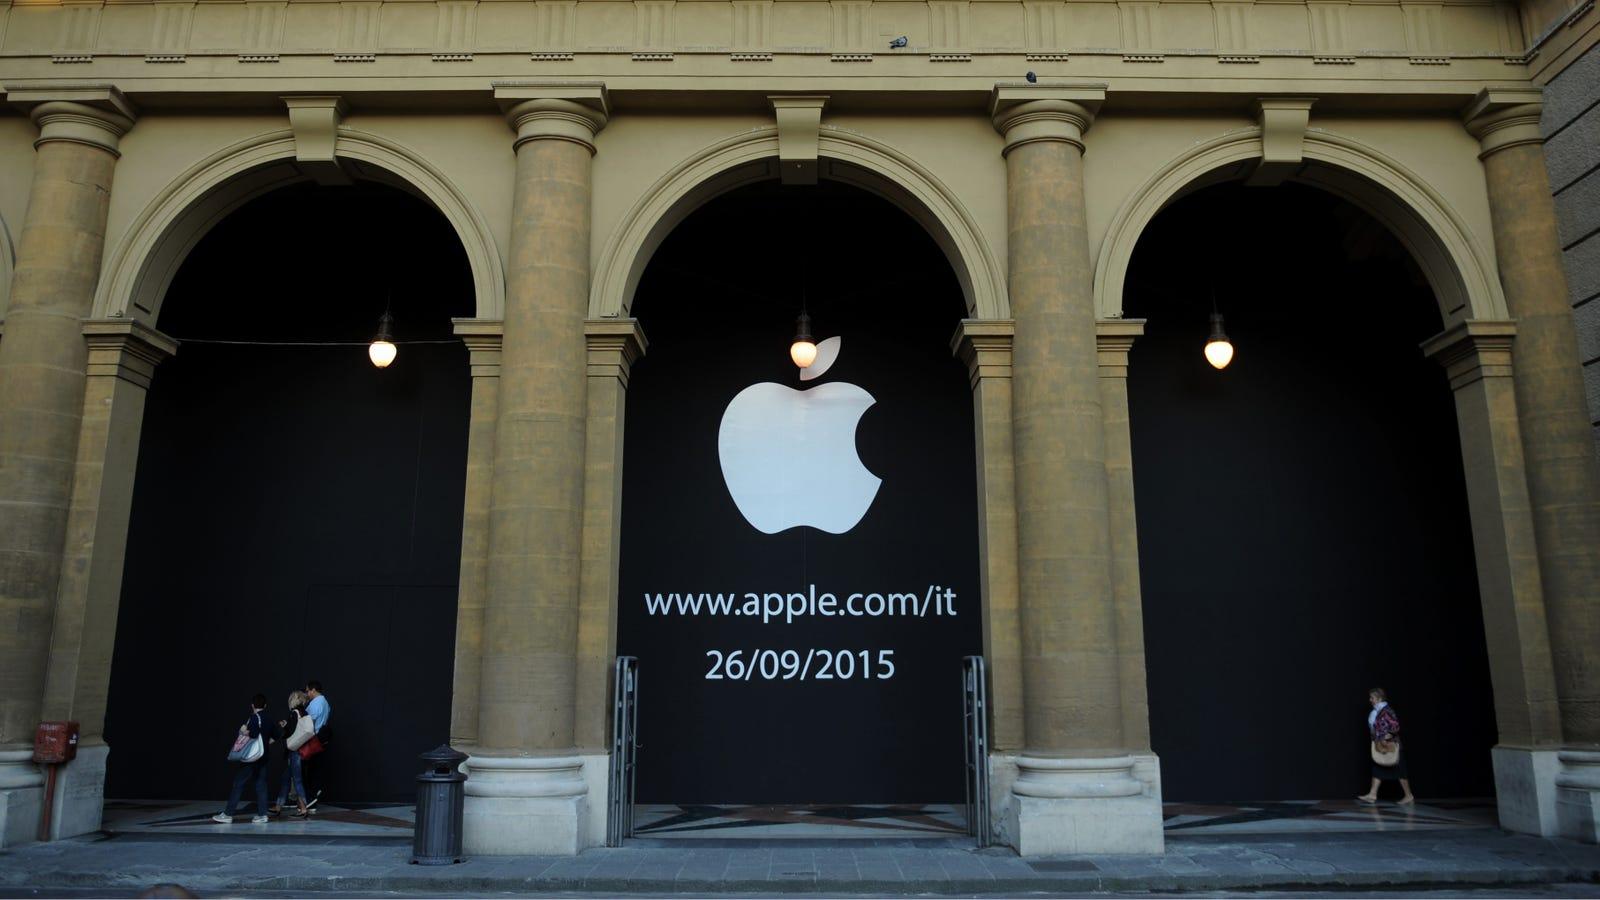 Despite Tim Cook's Trashtalking, Apple Will Pay Italy $348